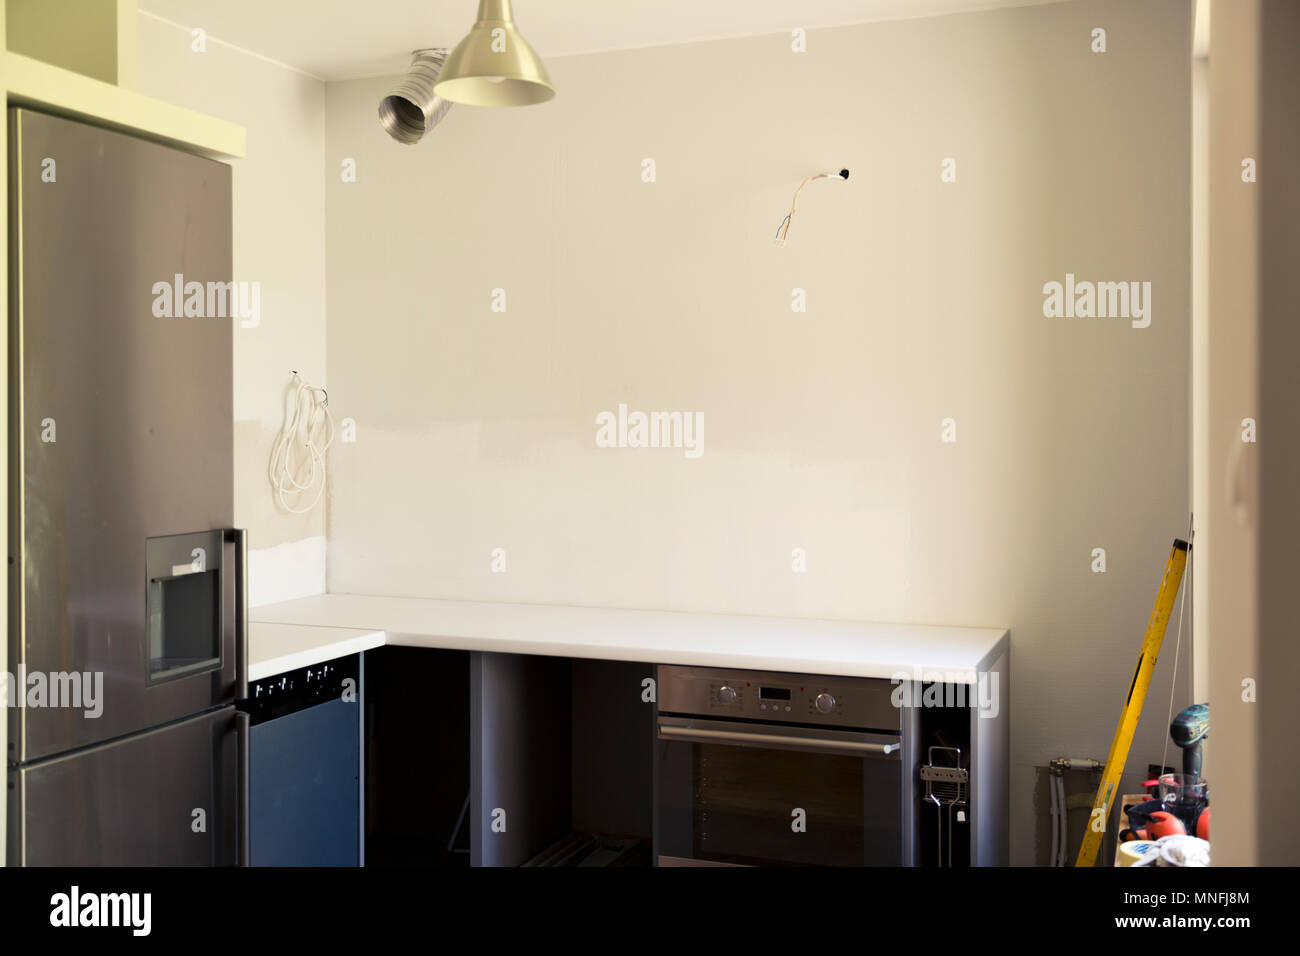 Redecorating Kitchen Stock Photos & Redecorating Kitchen ...